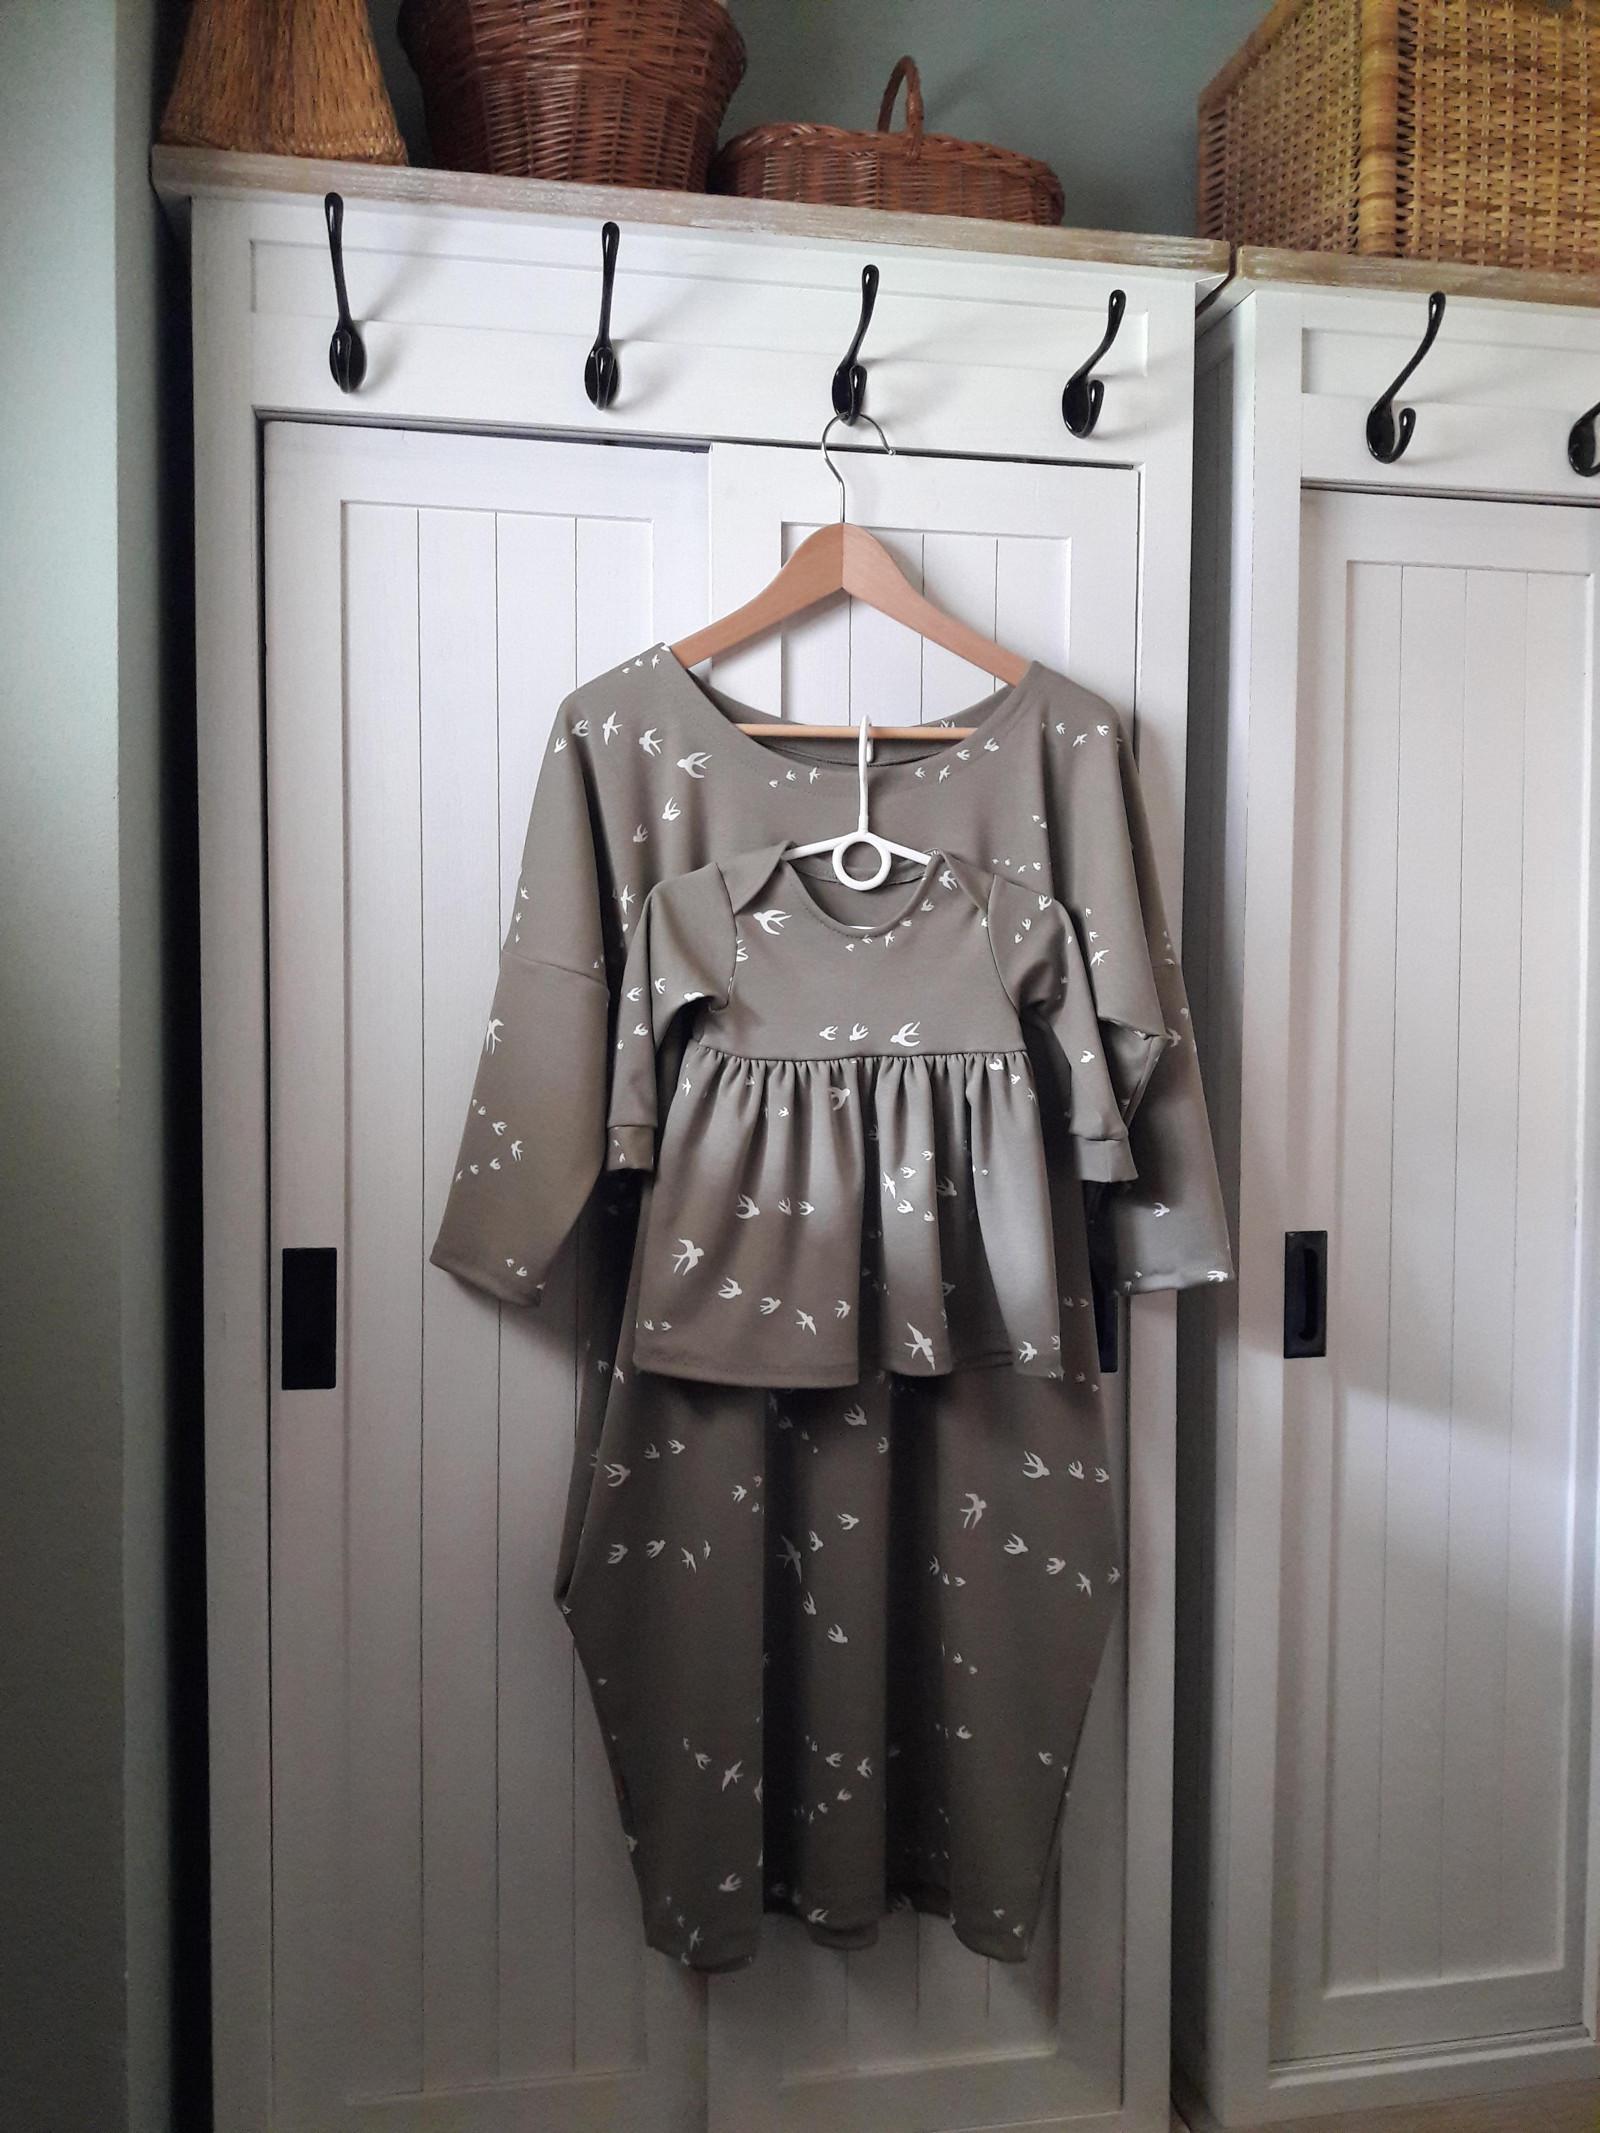 c22b4818447c Dámské šaty s kapsami